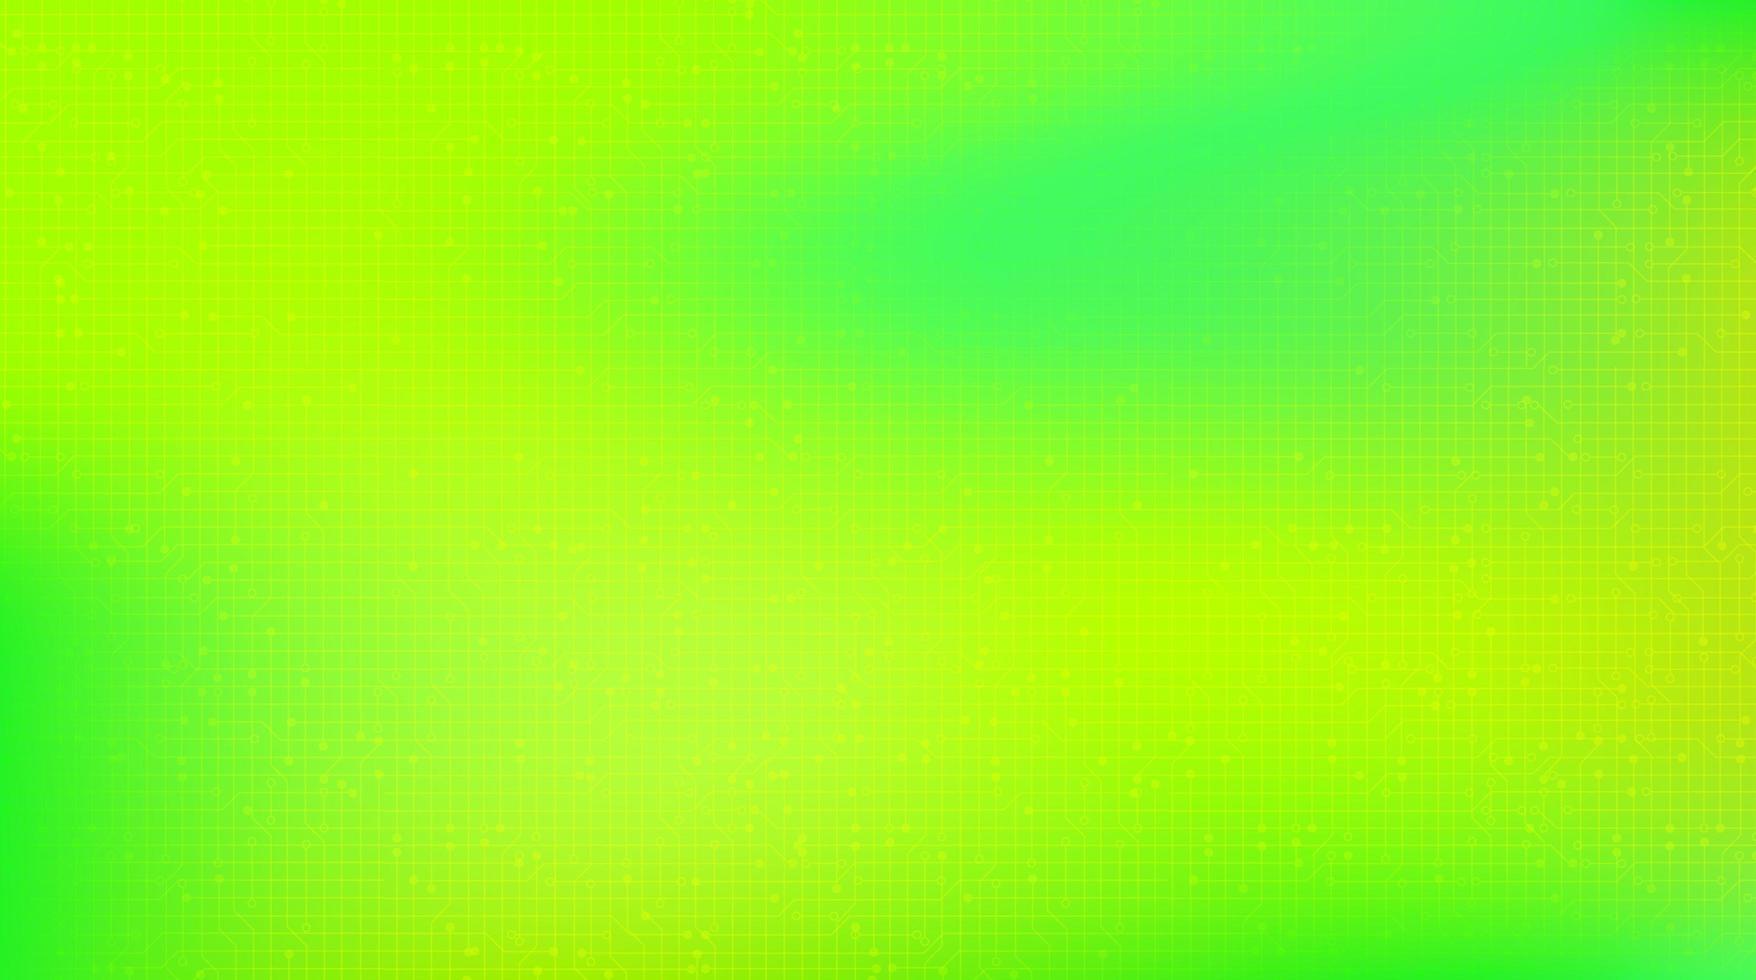 ljusgrön teknikbakgrund vektor